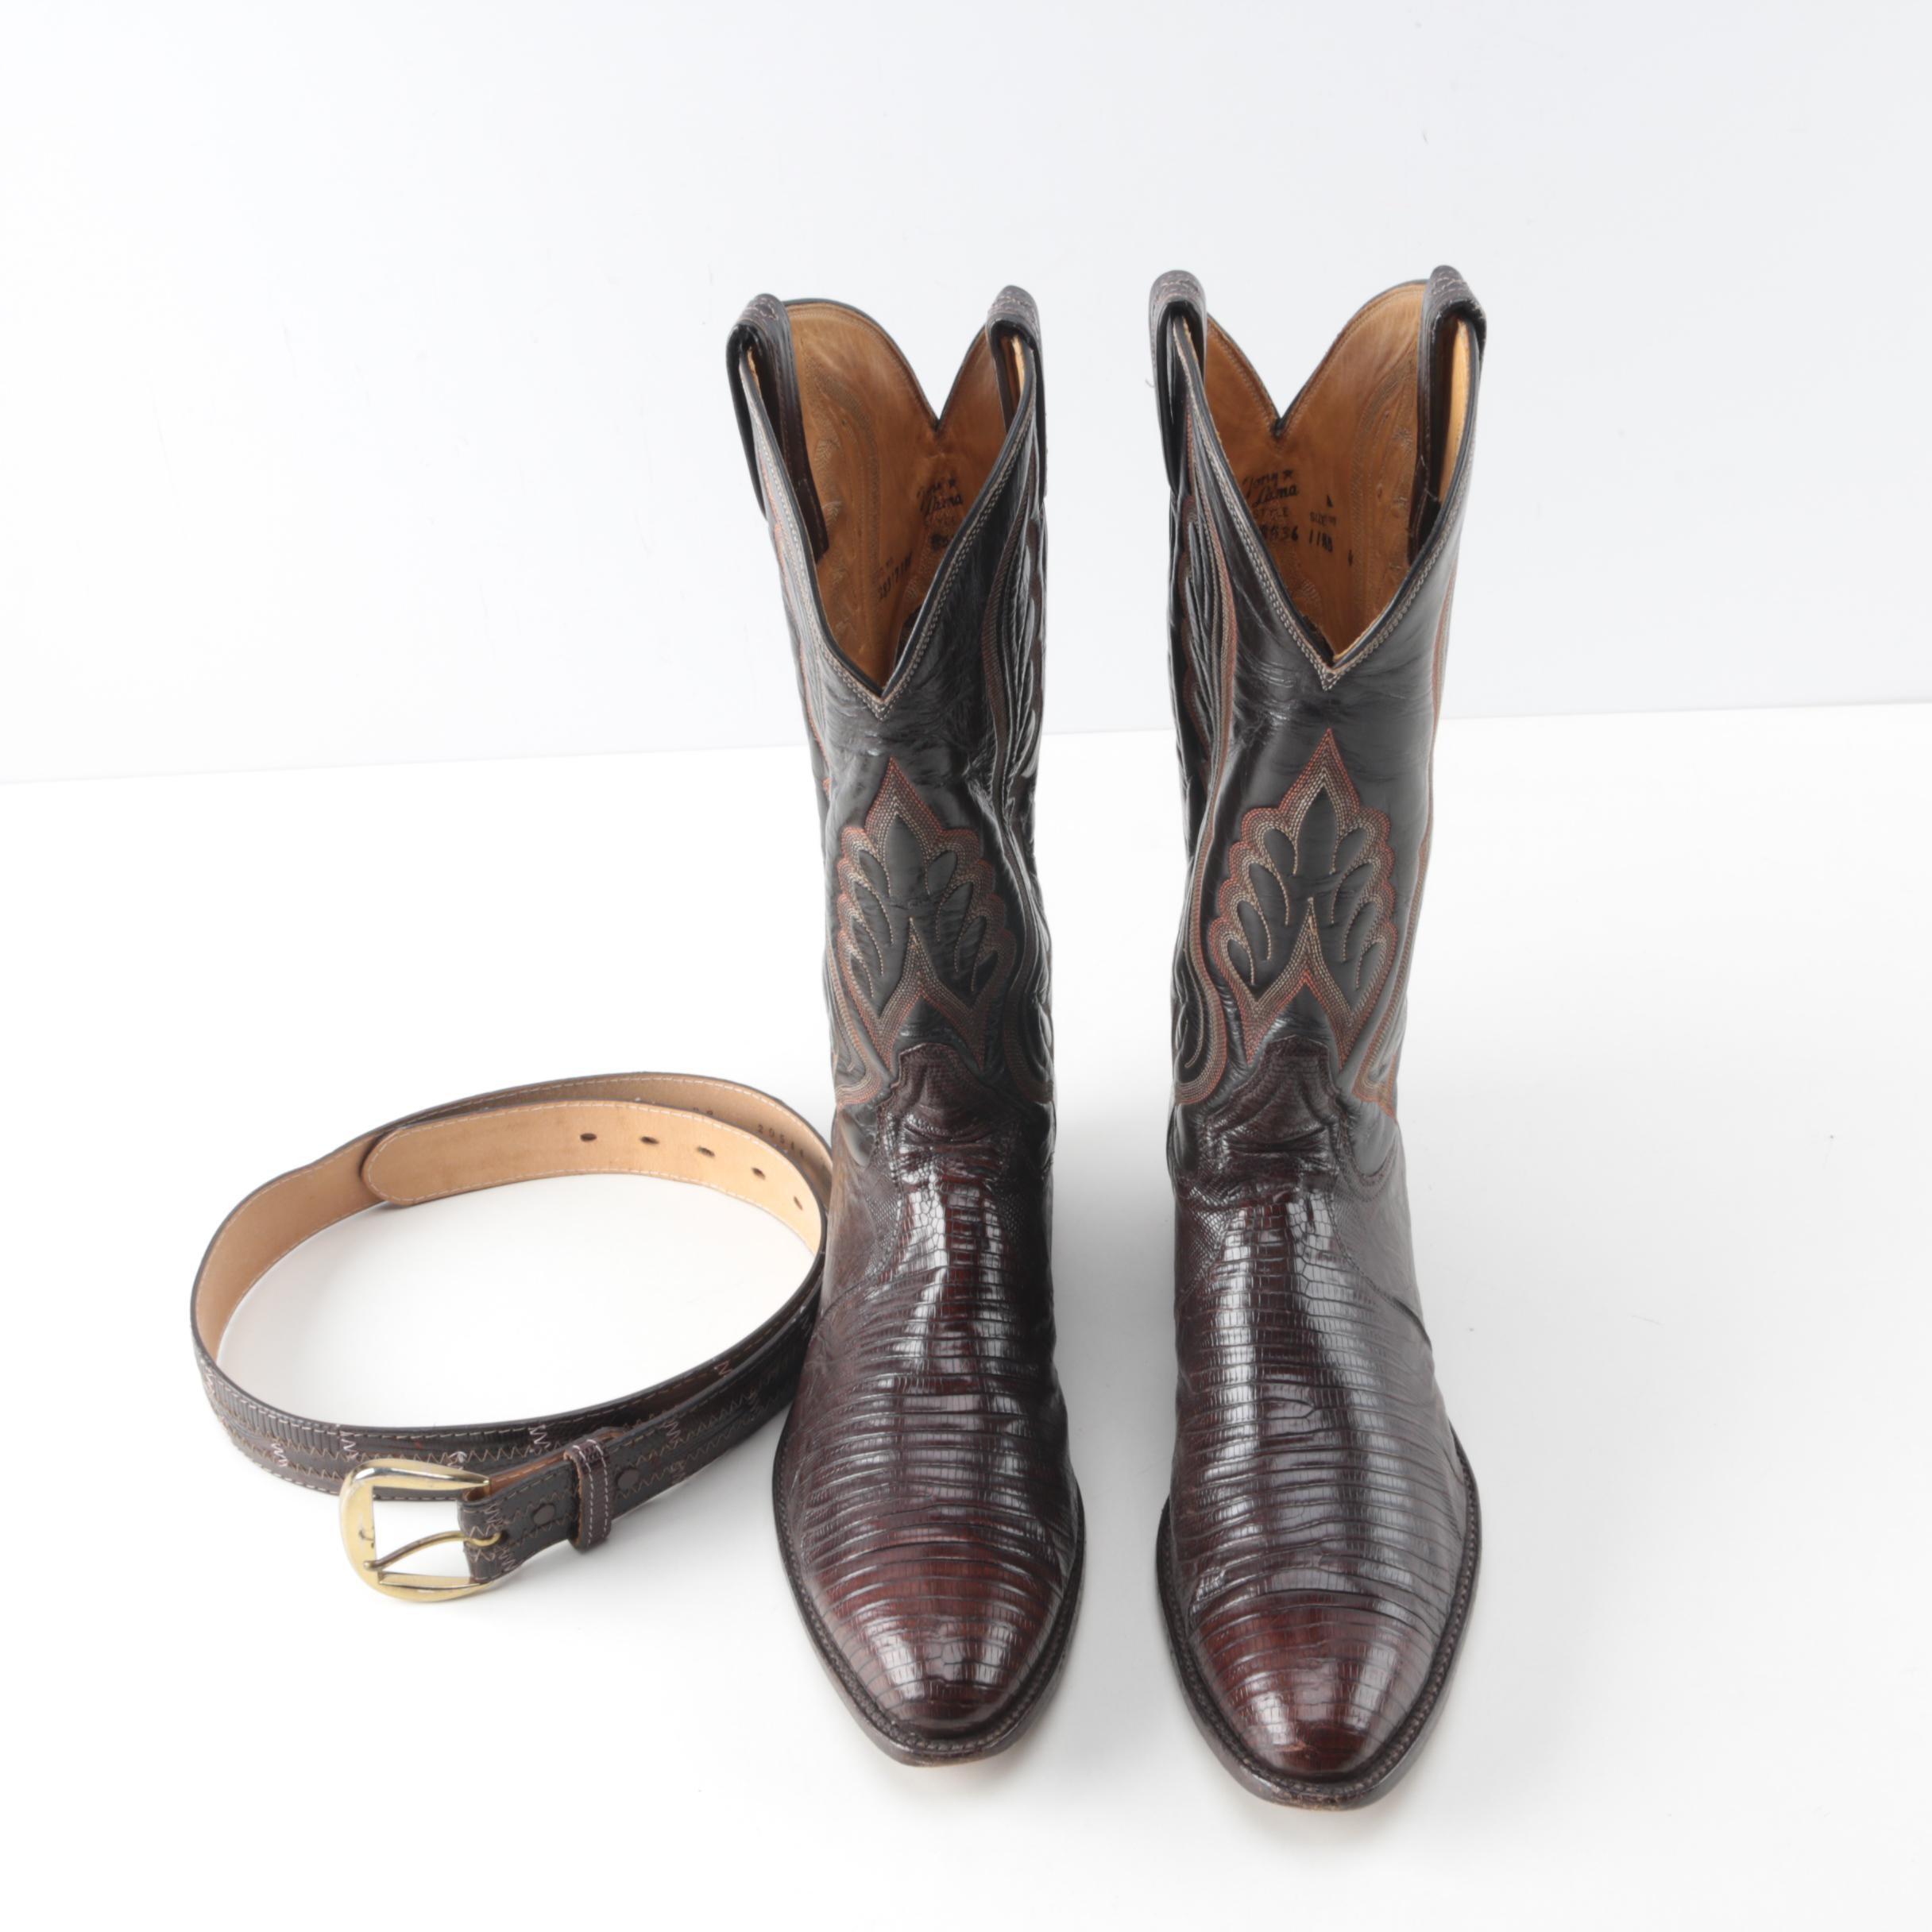 Tony Lama Boots and Belt